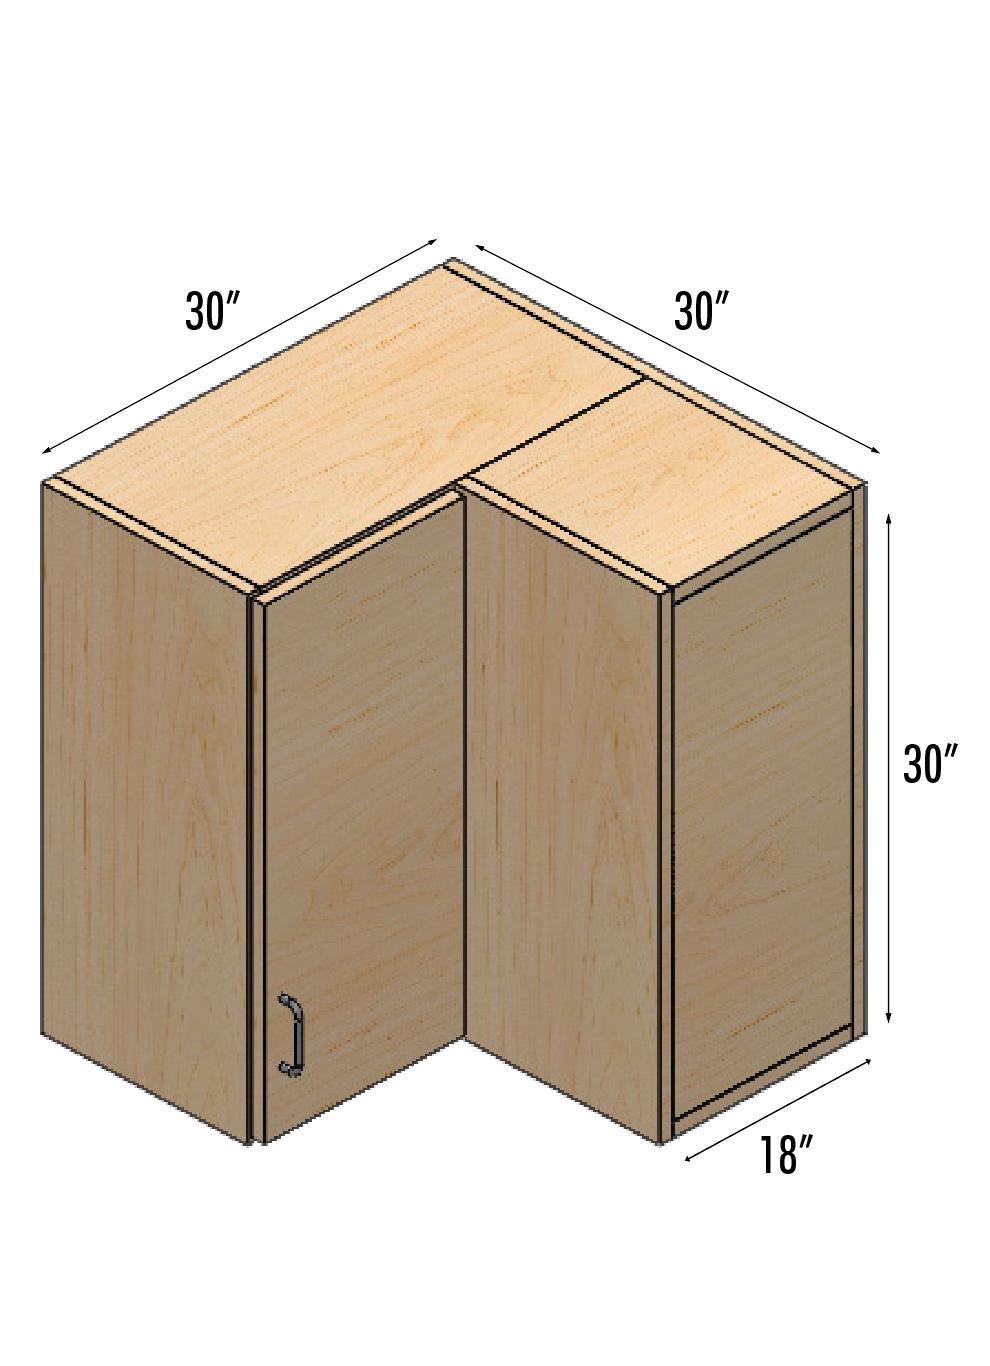 SEMCW-016 Wall Cabinet